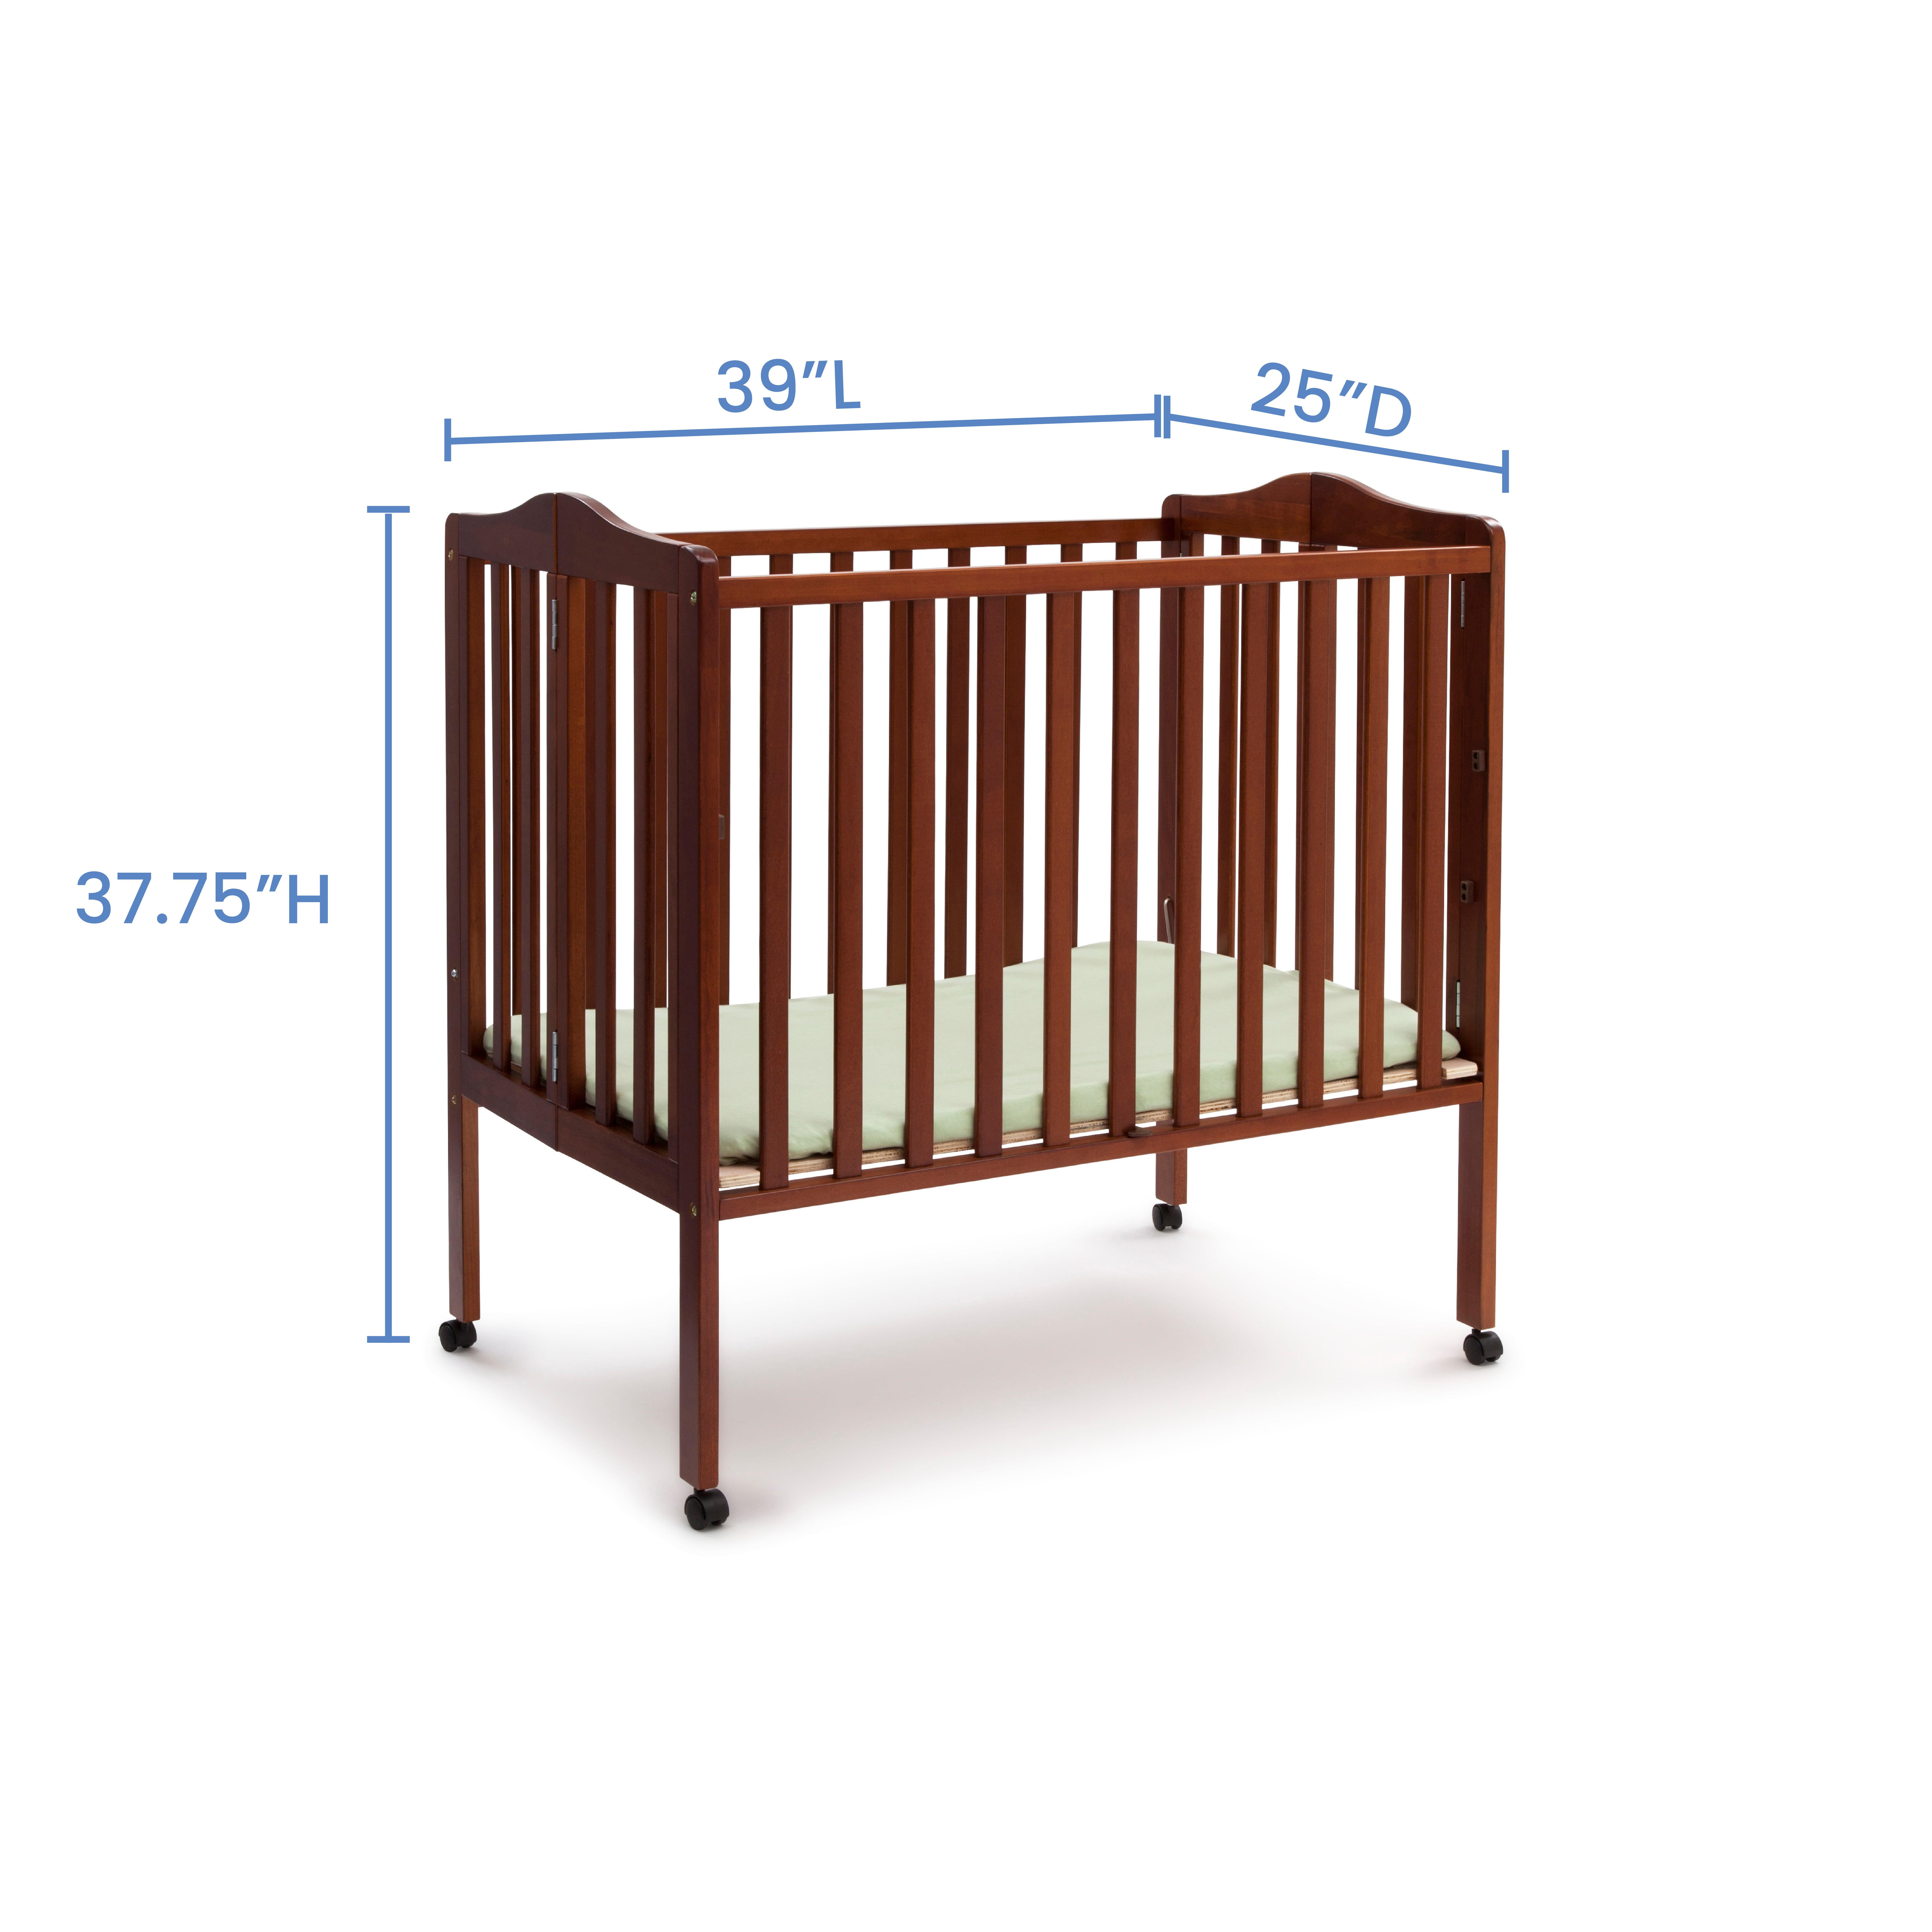 Portable Crib Mattress Waterproof Toddler Baby Travel Bed Sleep Furniture Cribs